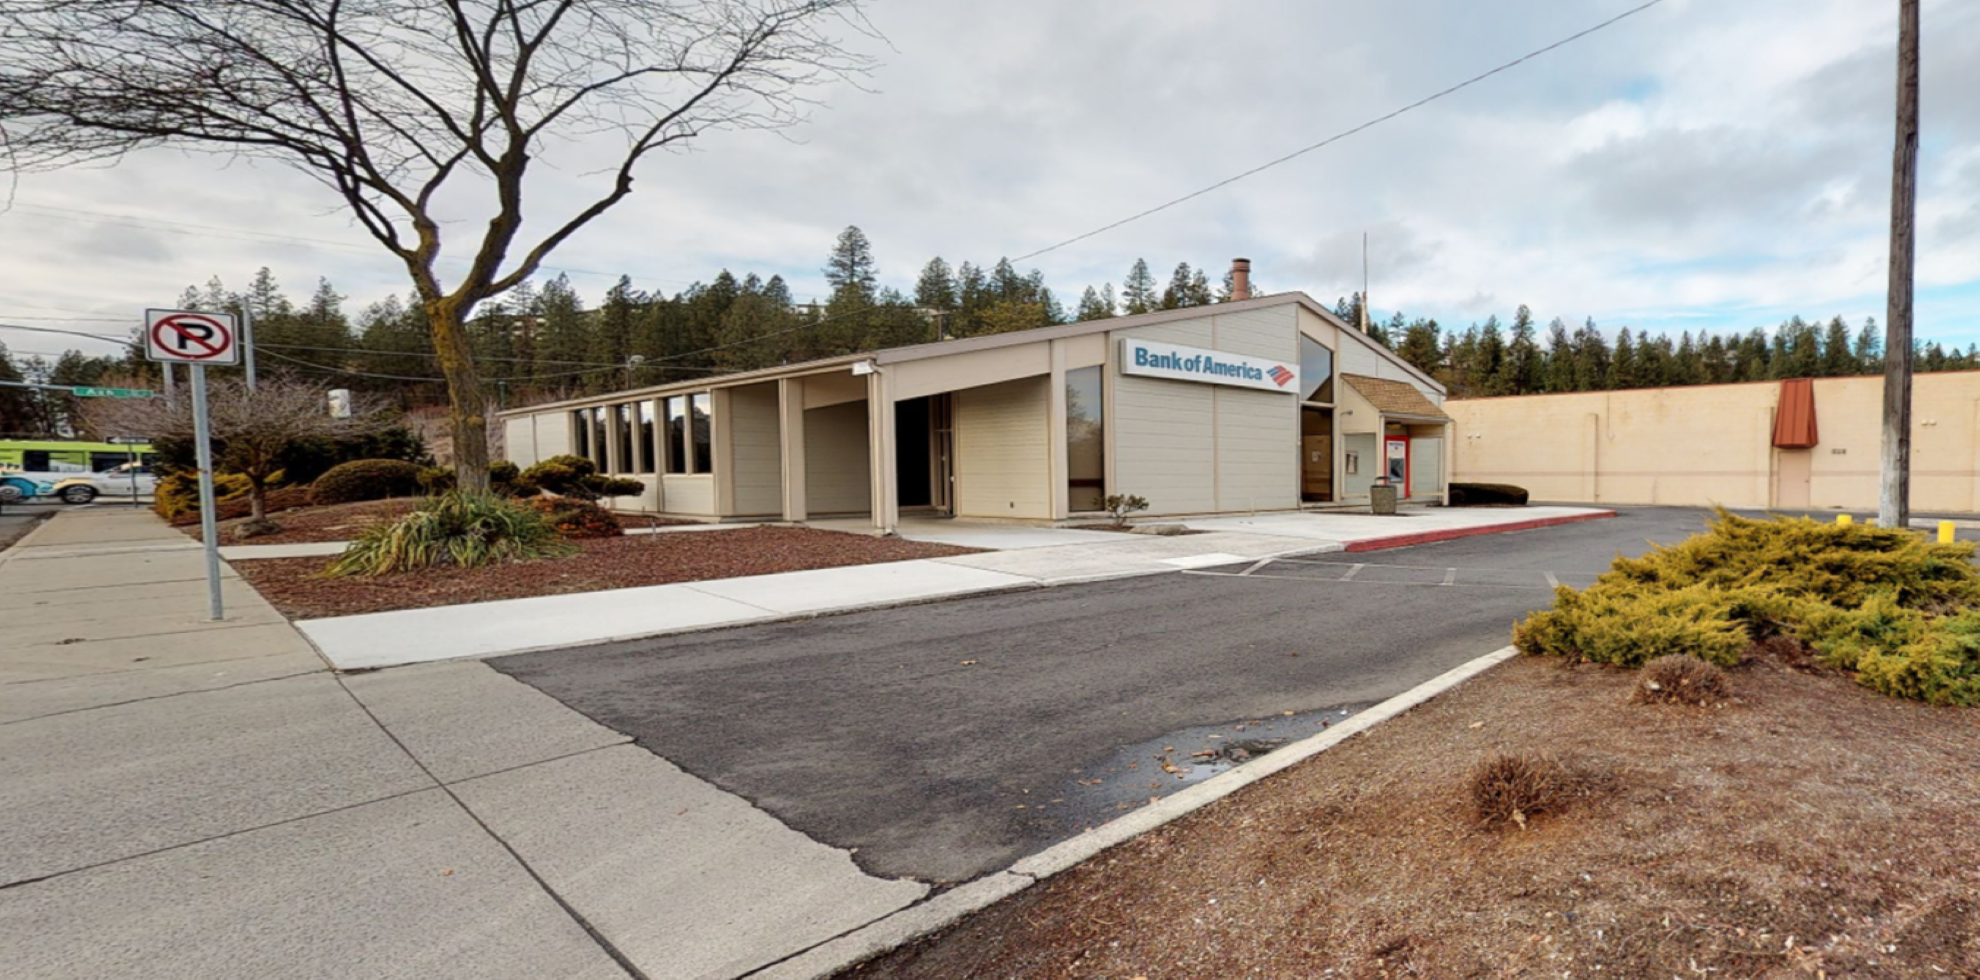 Bank of America financial center with walk-up ATM   1628 W Five Mile Rd, Spokane, WA 99208